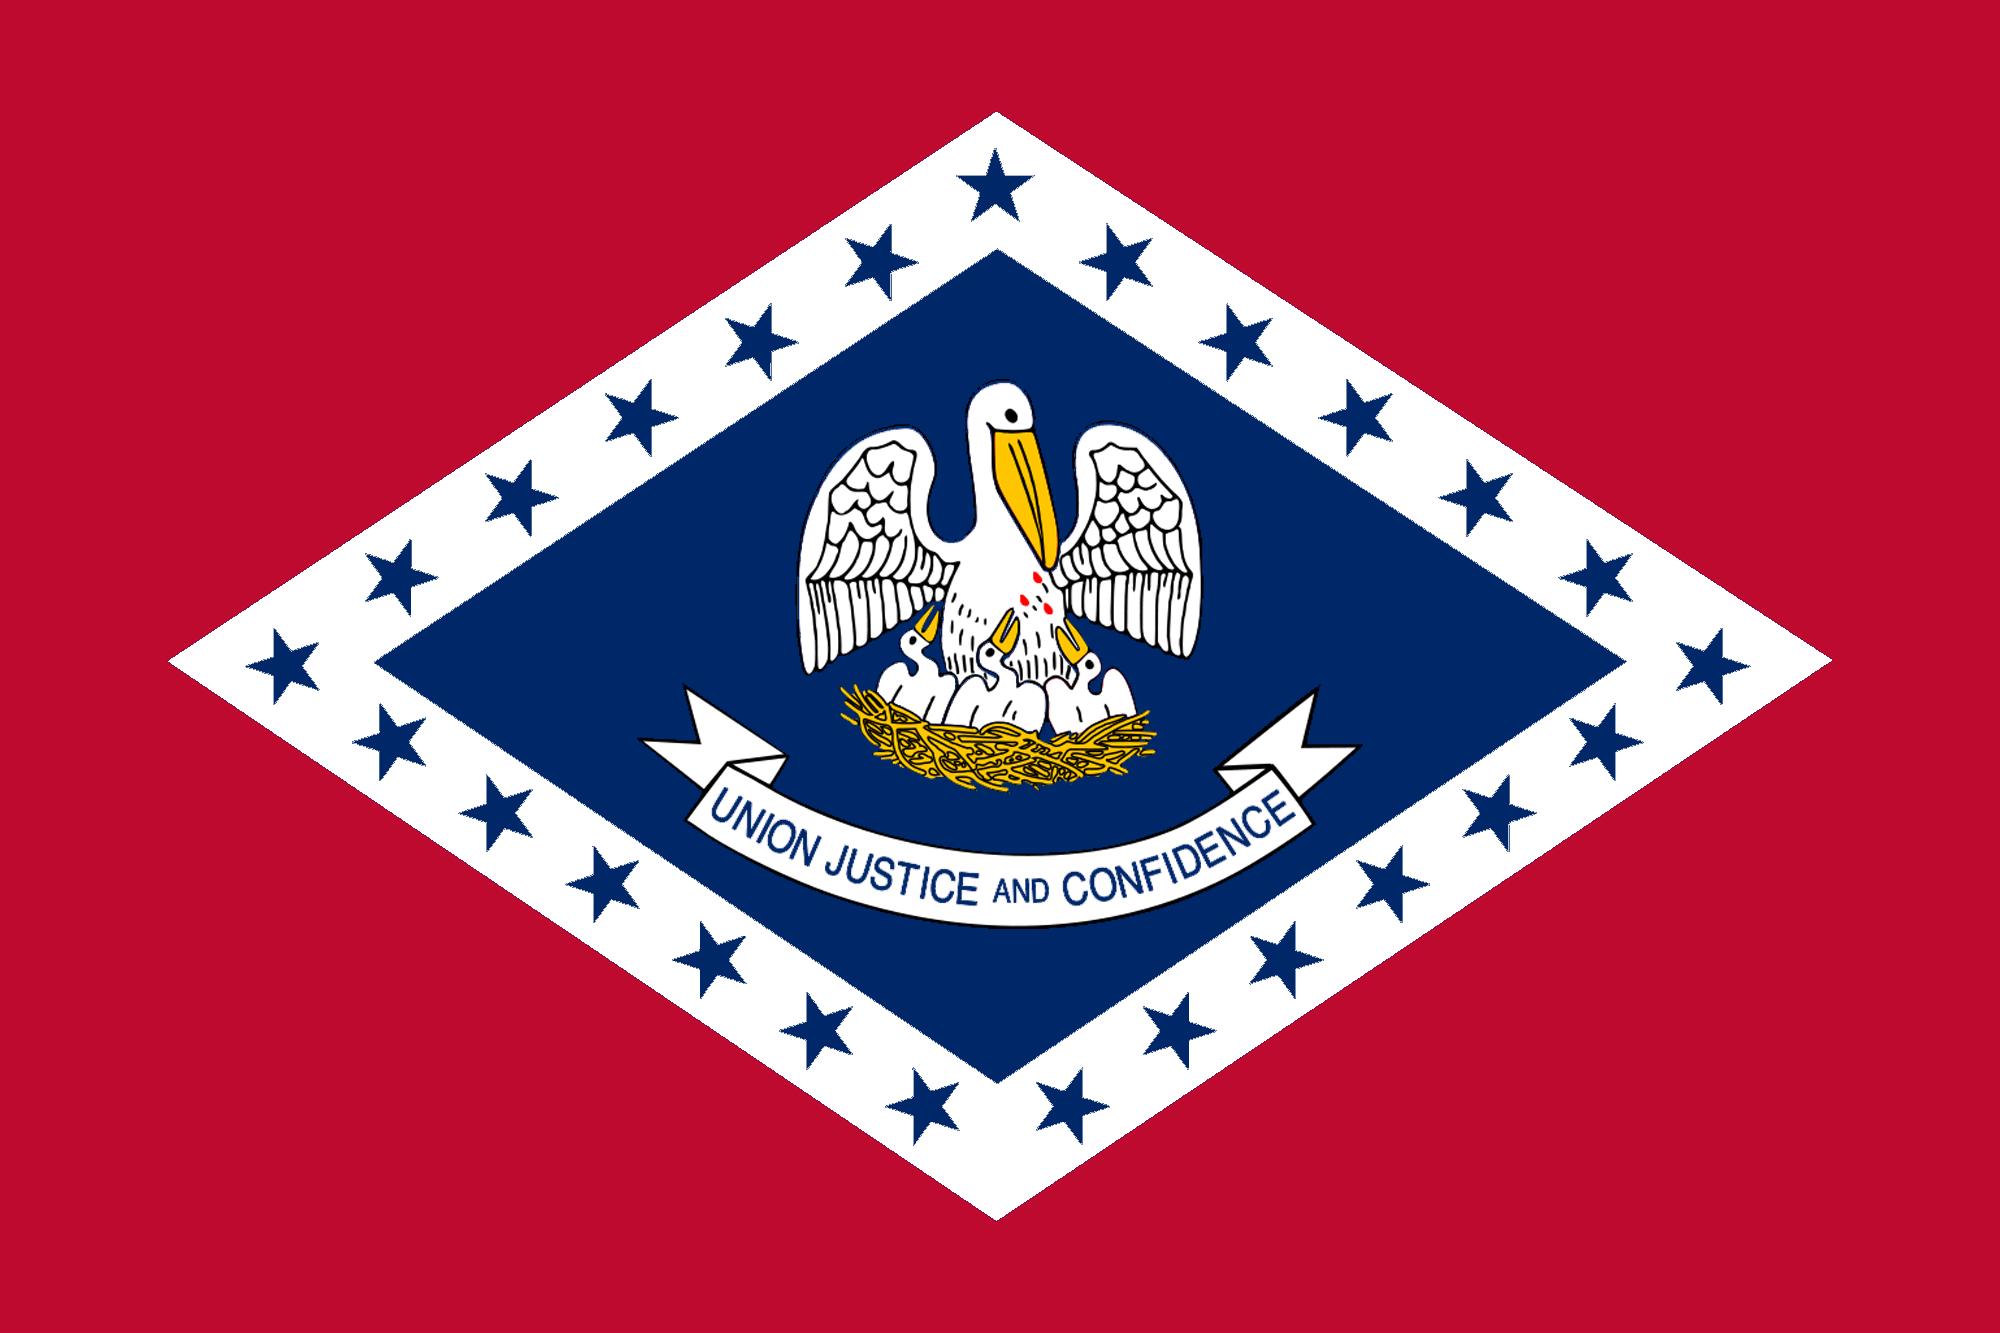 Bandera-arkanso louisiana.png